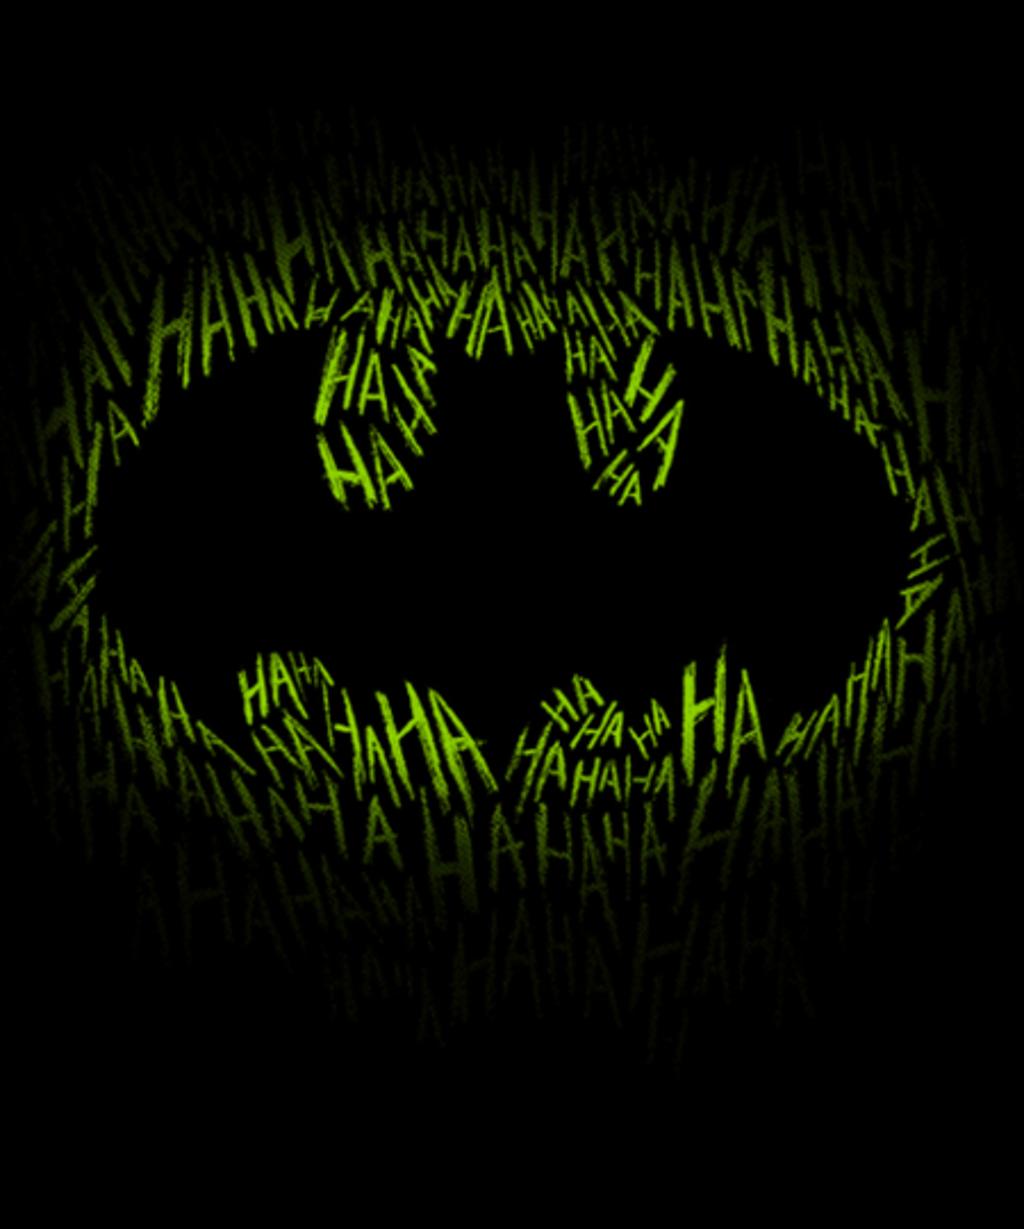 Qwertee: Bat joke